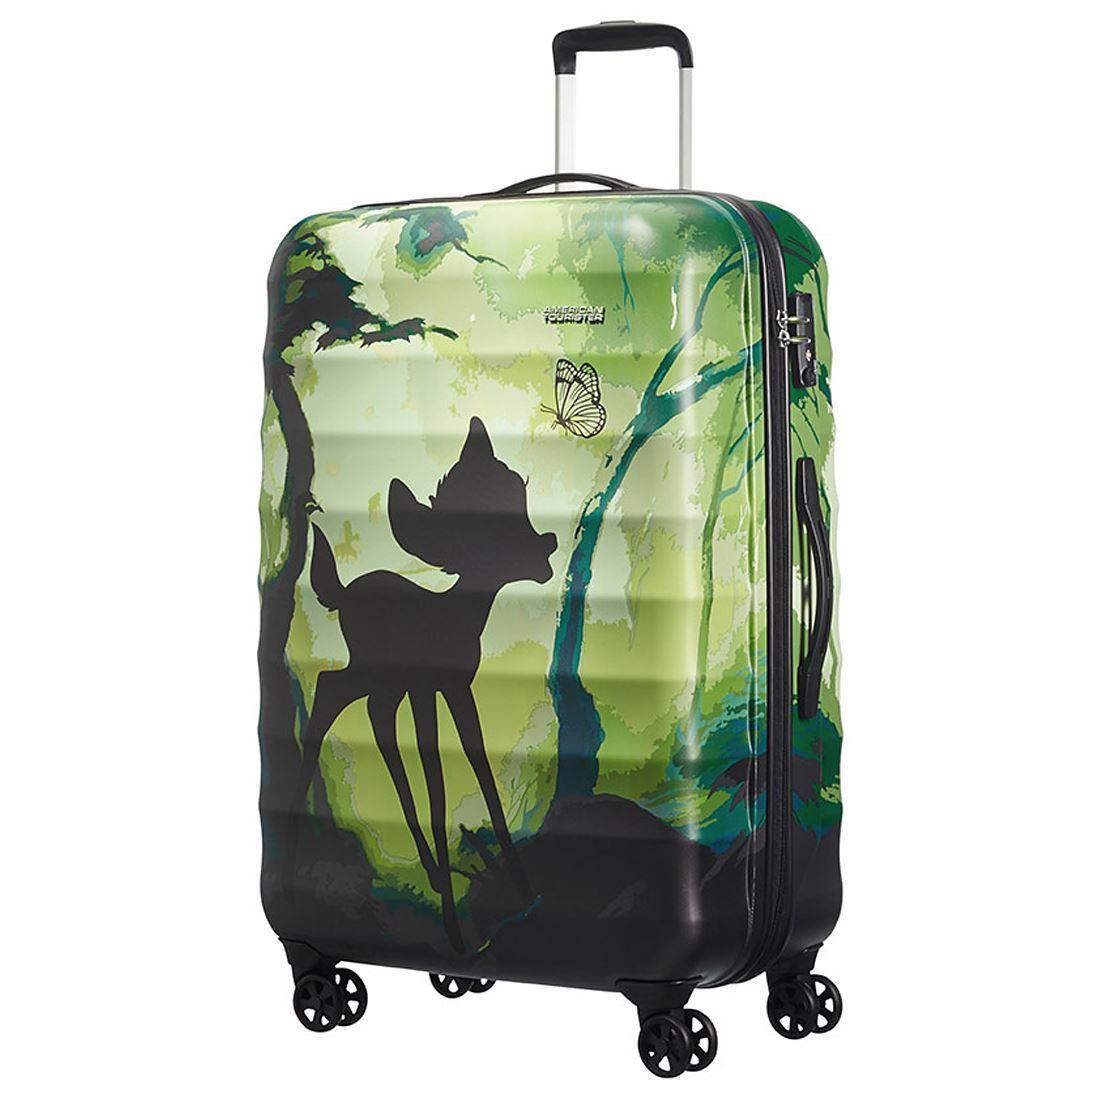 Ebay Uk: American Tourister Palm Valley Suitcase Minnie & Micky